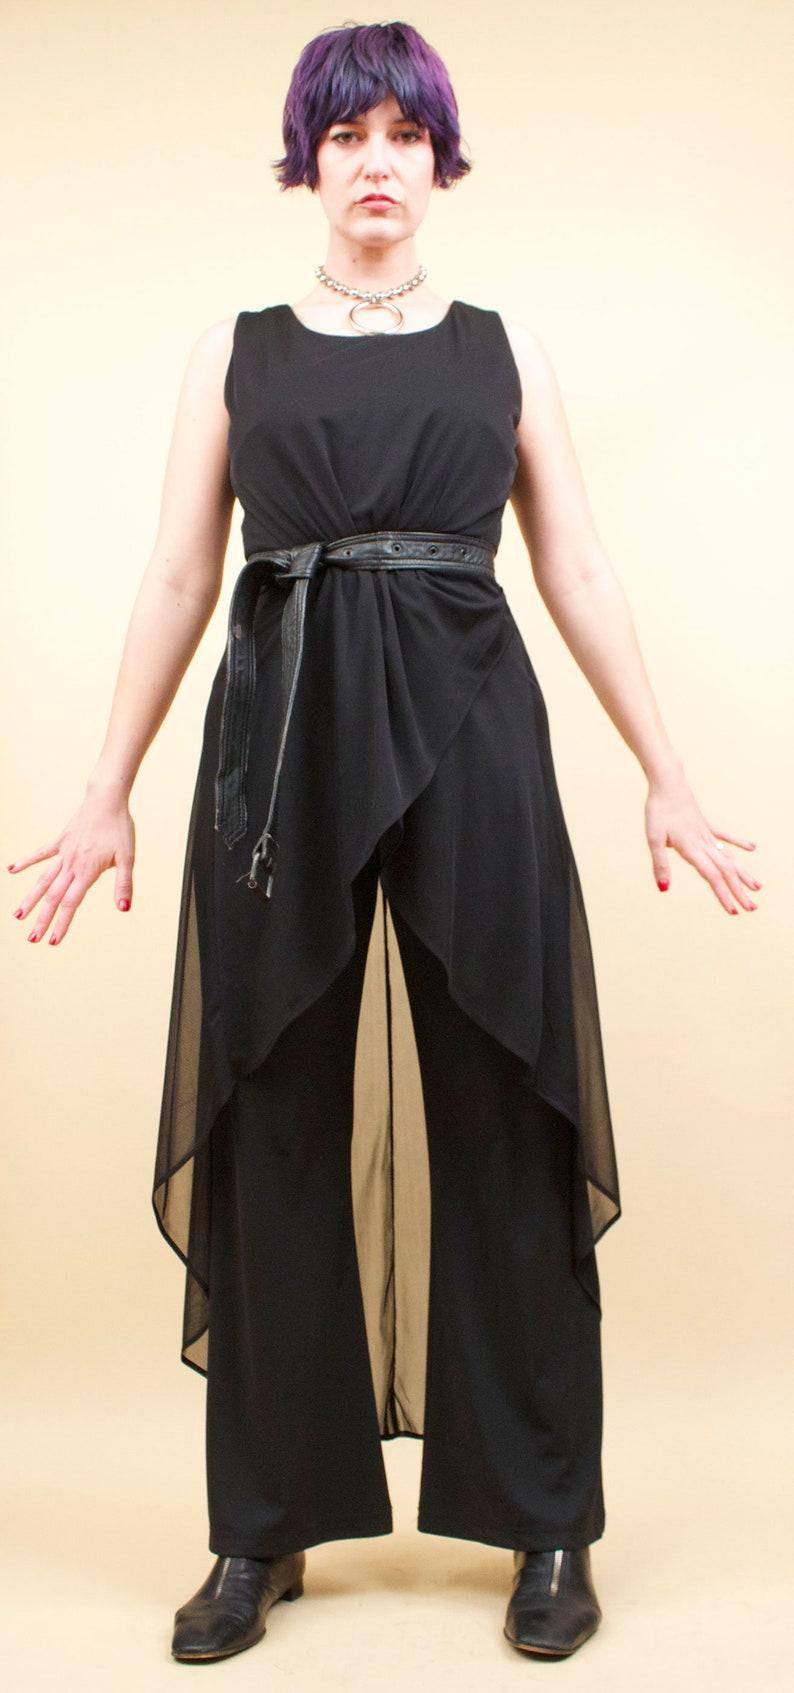 90s Vtg Jet Black Pantsuit Wide Leg Cascading Sheer Overlay Layered Avant Garde Minimalist Mod Jumpsuit tag 14 fits 12 Large